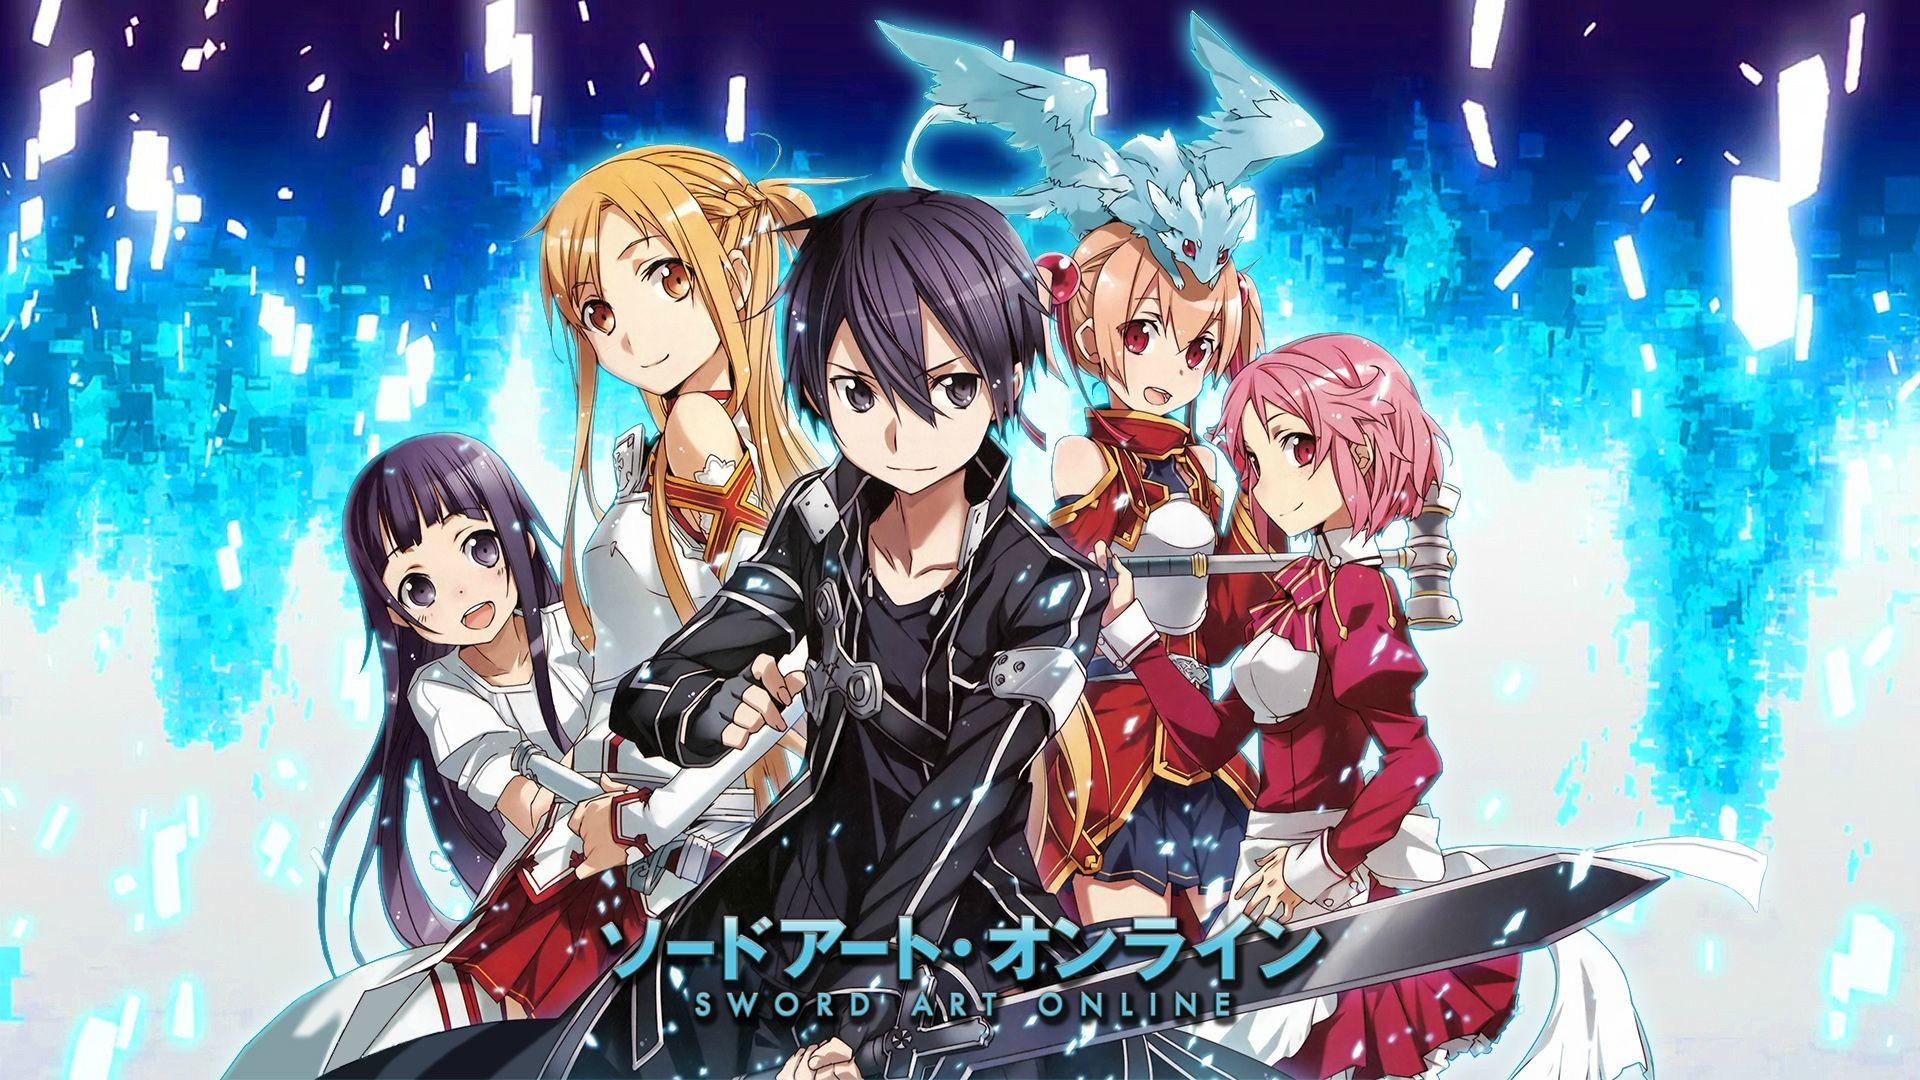 Sword Art Online Yui Asuna Kirito Silica, Pina and Lisbeth Wallpaper